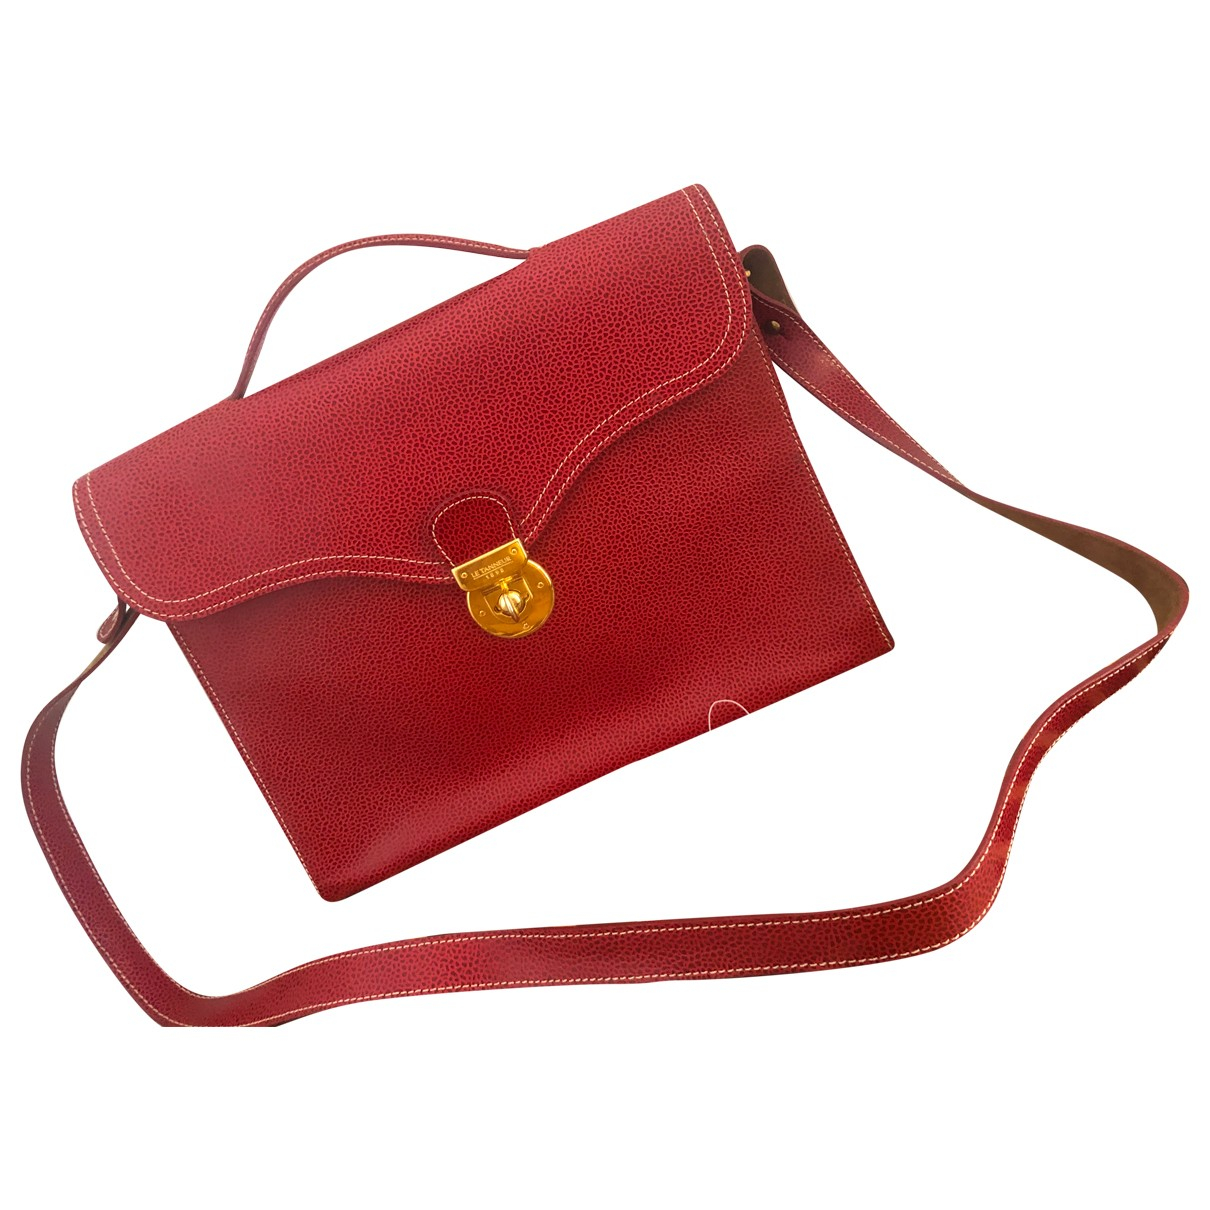 Le Tanneur \N Red Leather handbag for Women \N